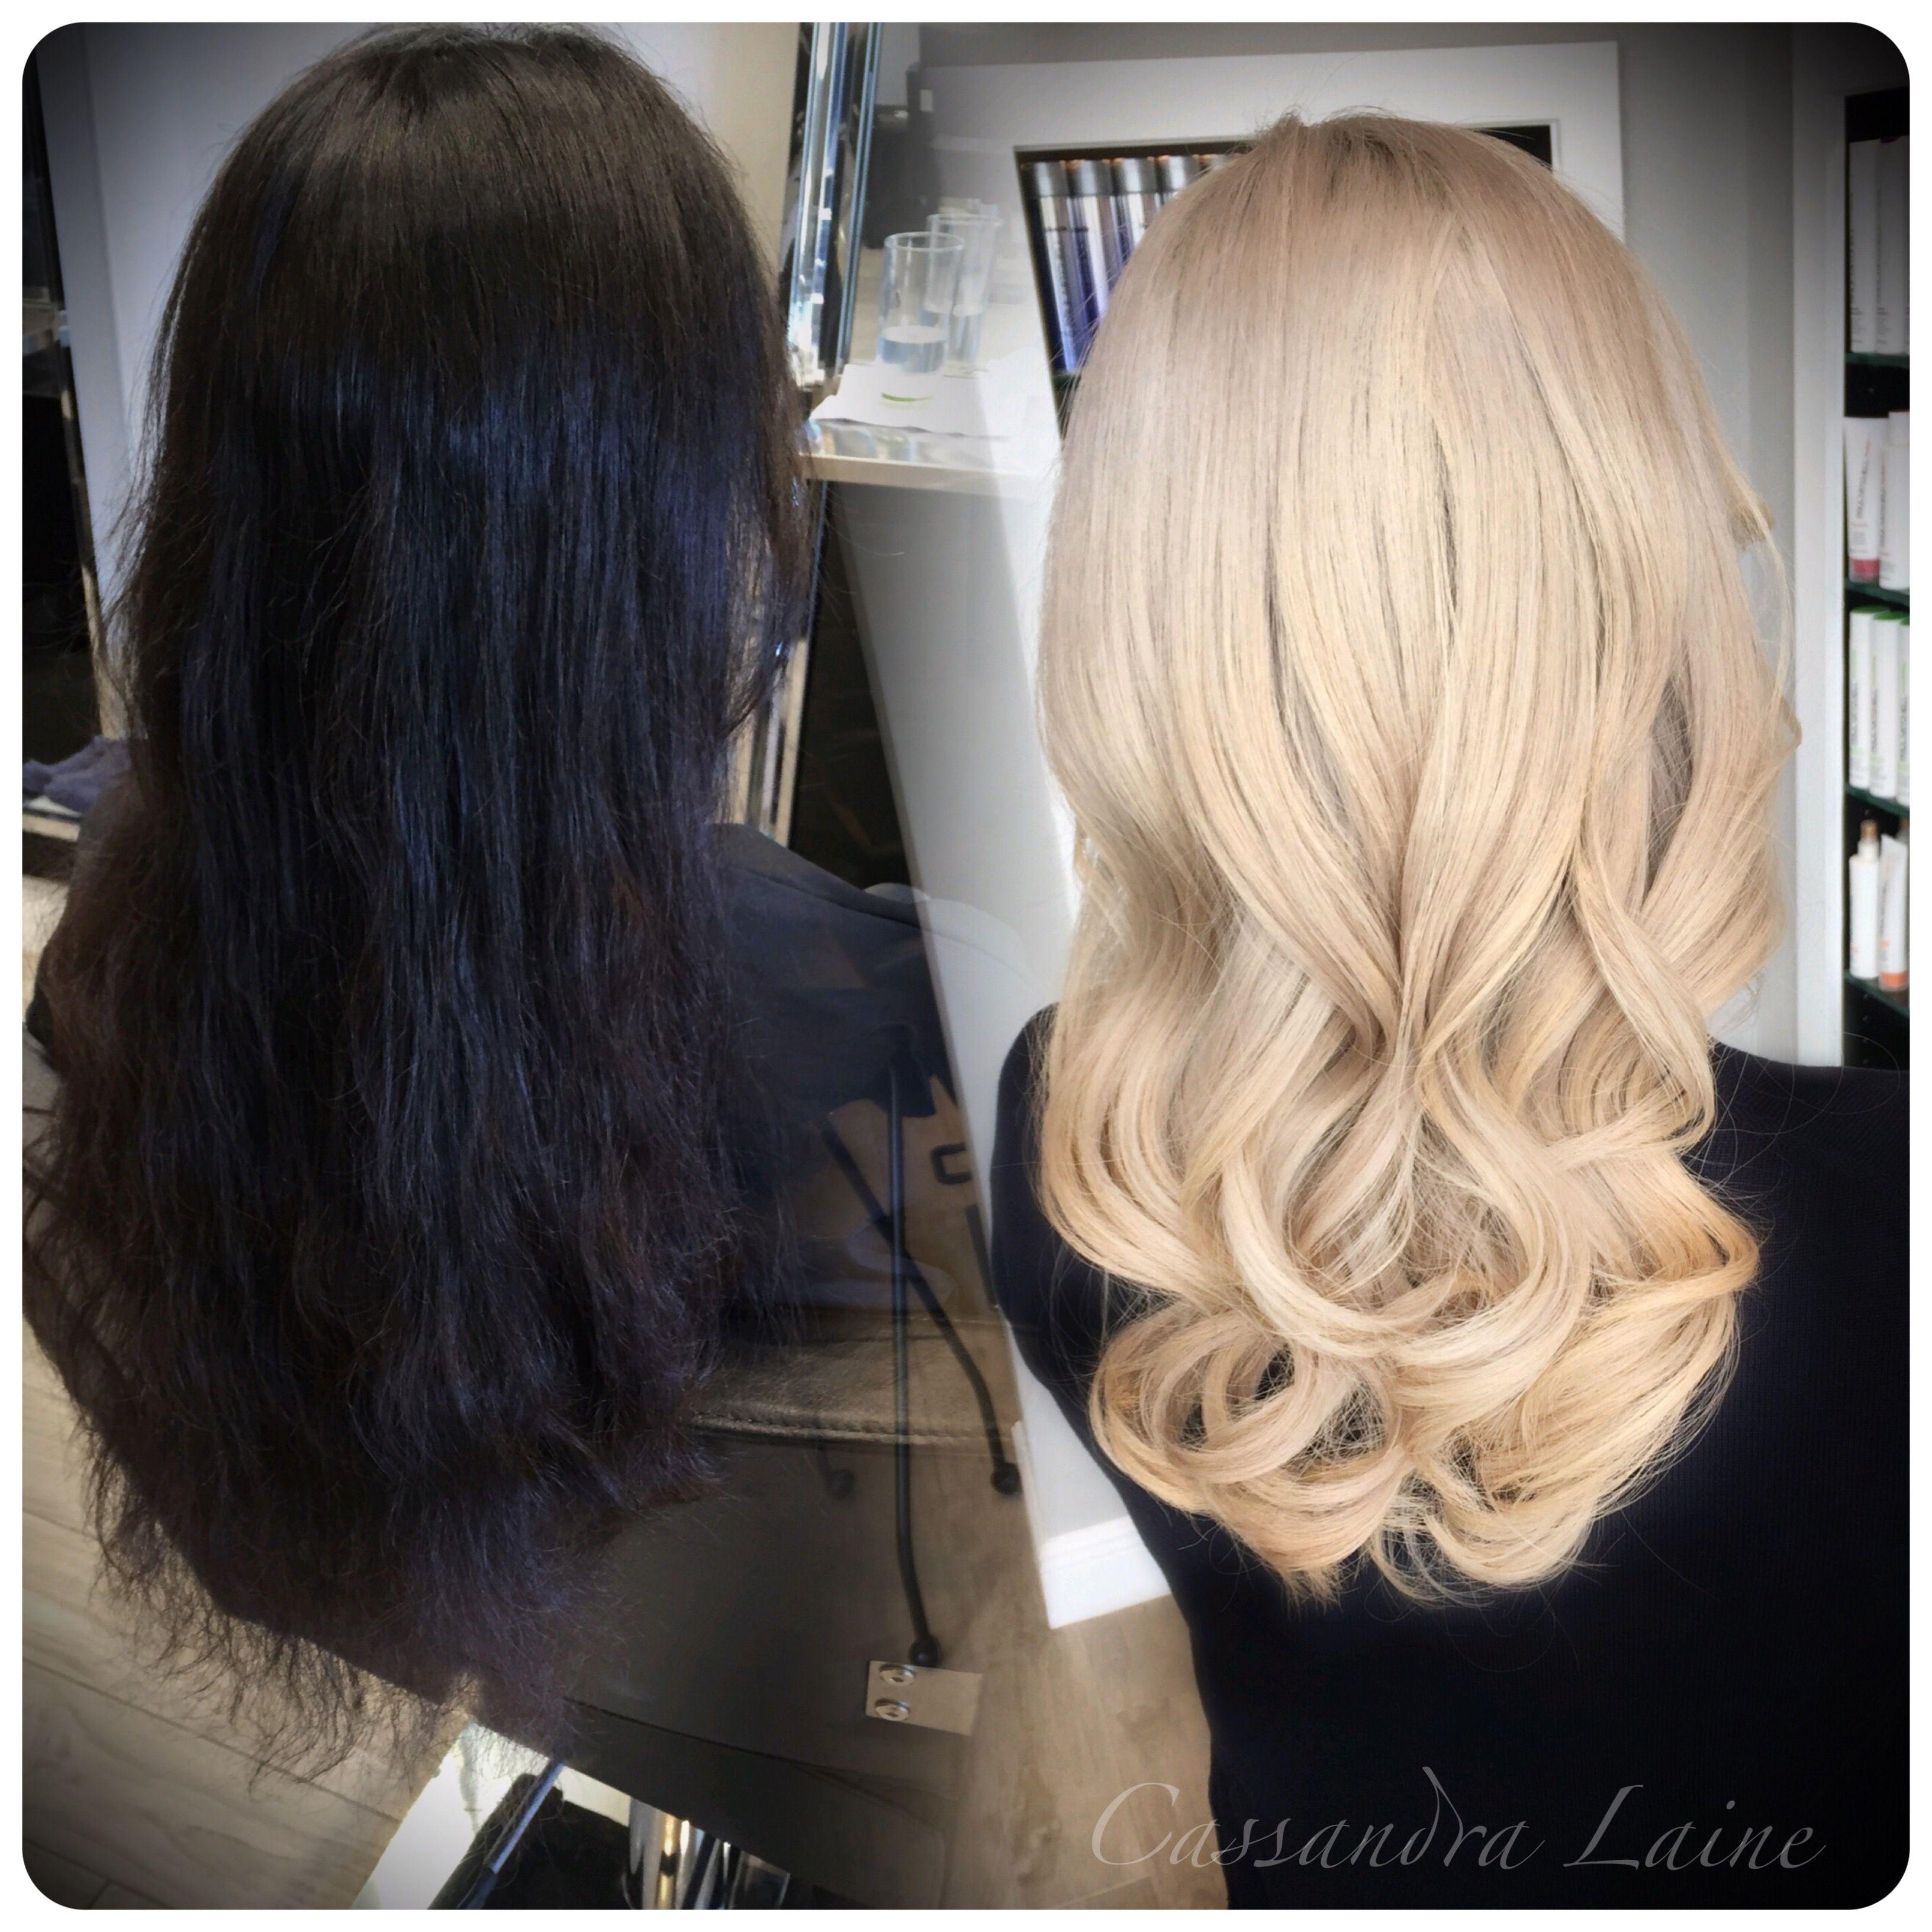 Dramatic Transformation Jet Black To Platinum In One Day Bleaching Black Hair Dark To Light Hair Black To Blonde Hair